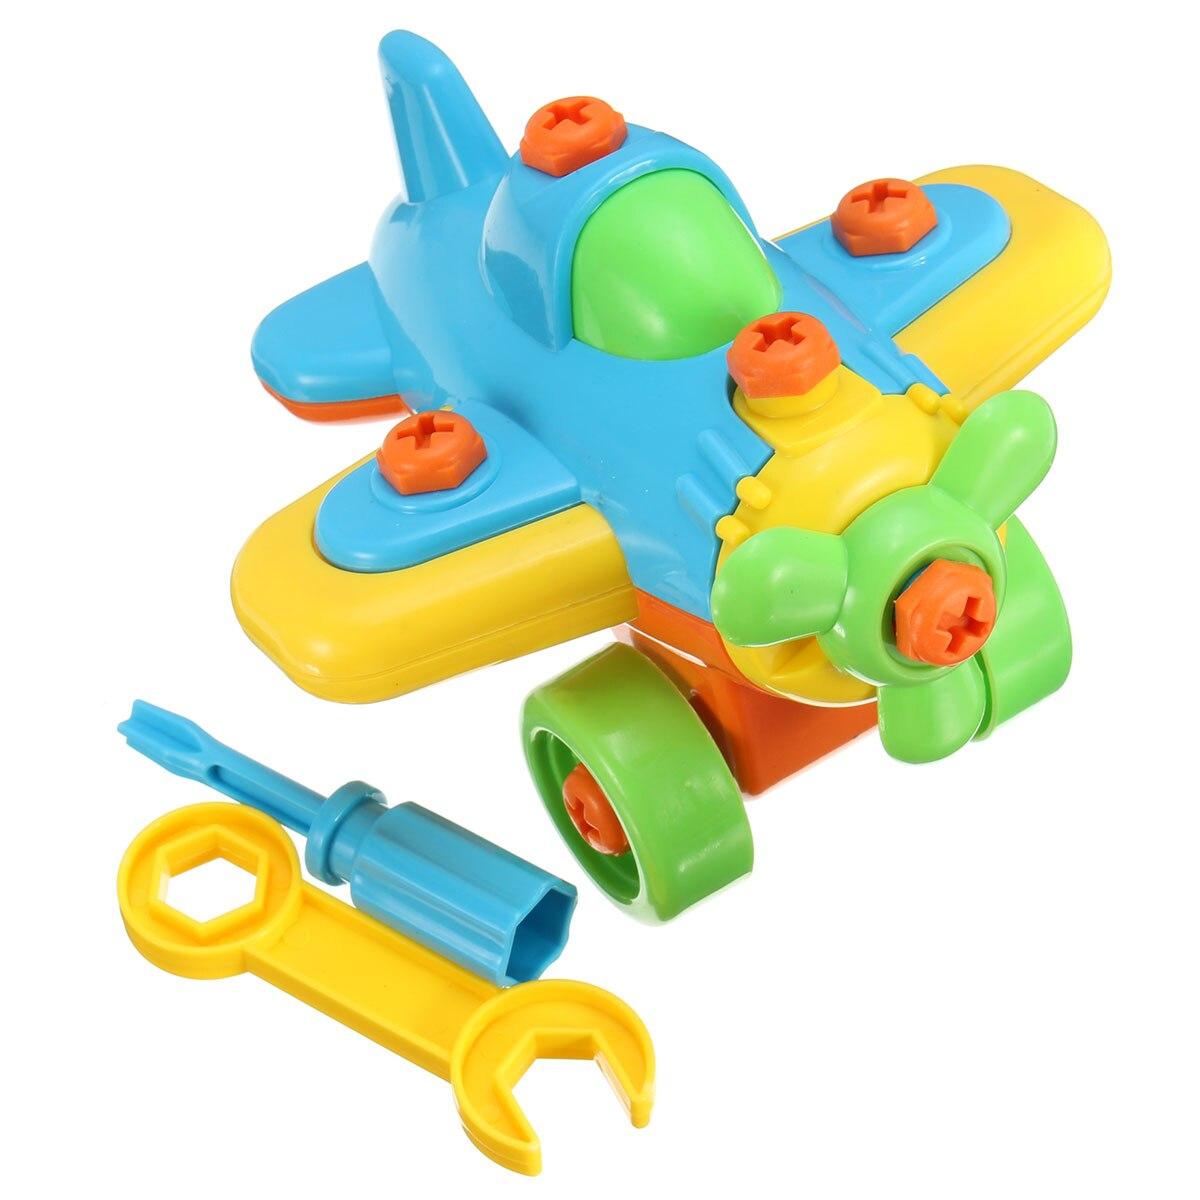 New DIY Disassembling Small Plane Building Blocks Children Assembled Model Tool clamp With Screwdriver Educational Toys new 105934 037 thermal printhead printer print head for zebra zp450 zp550 zp500 gx420 gk420 gx420d gk420d zp420d